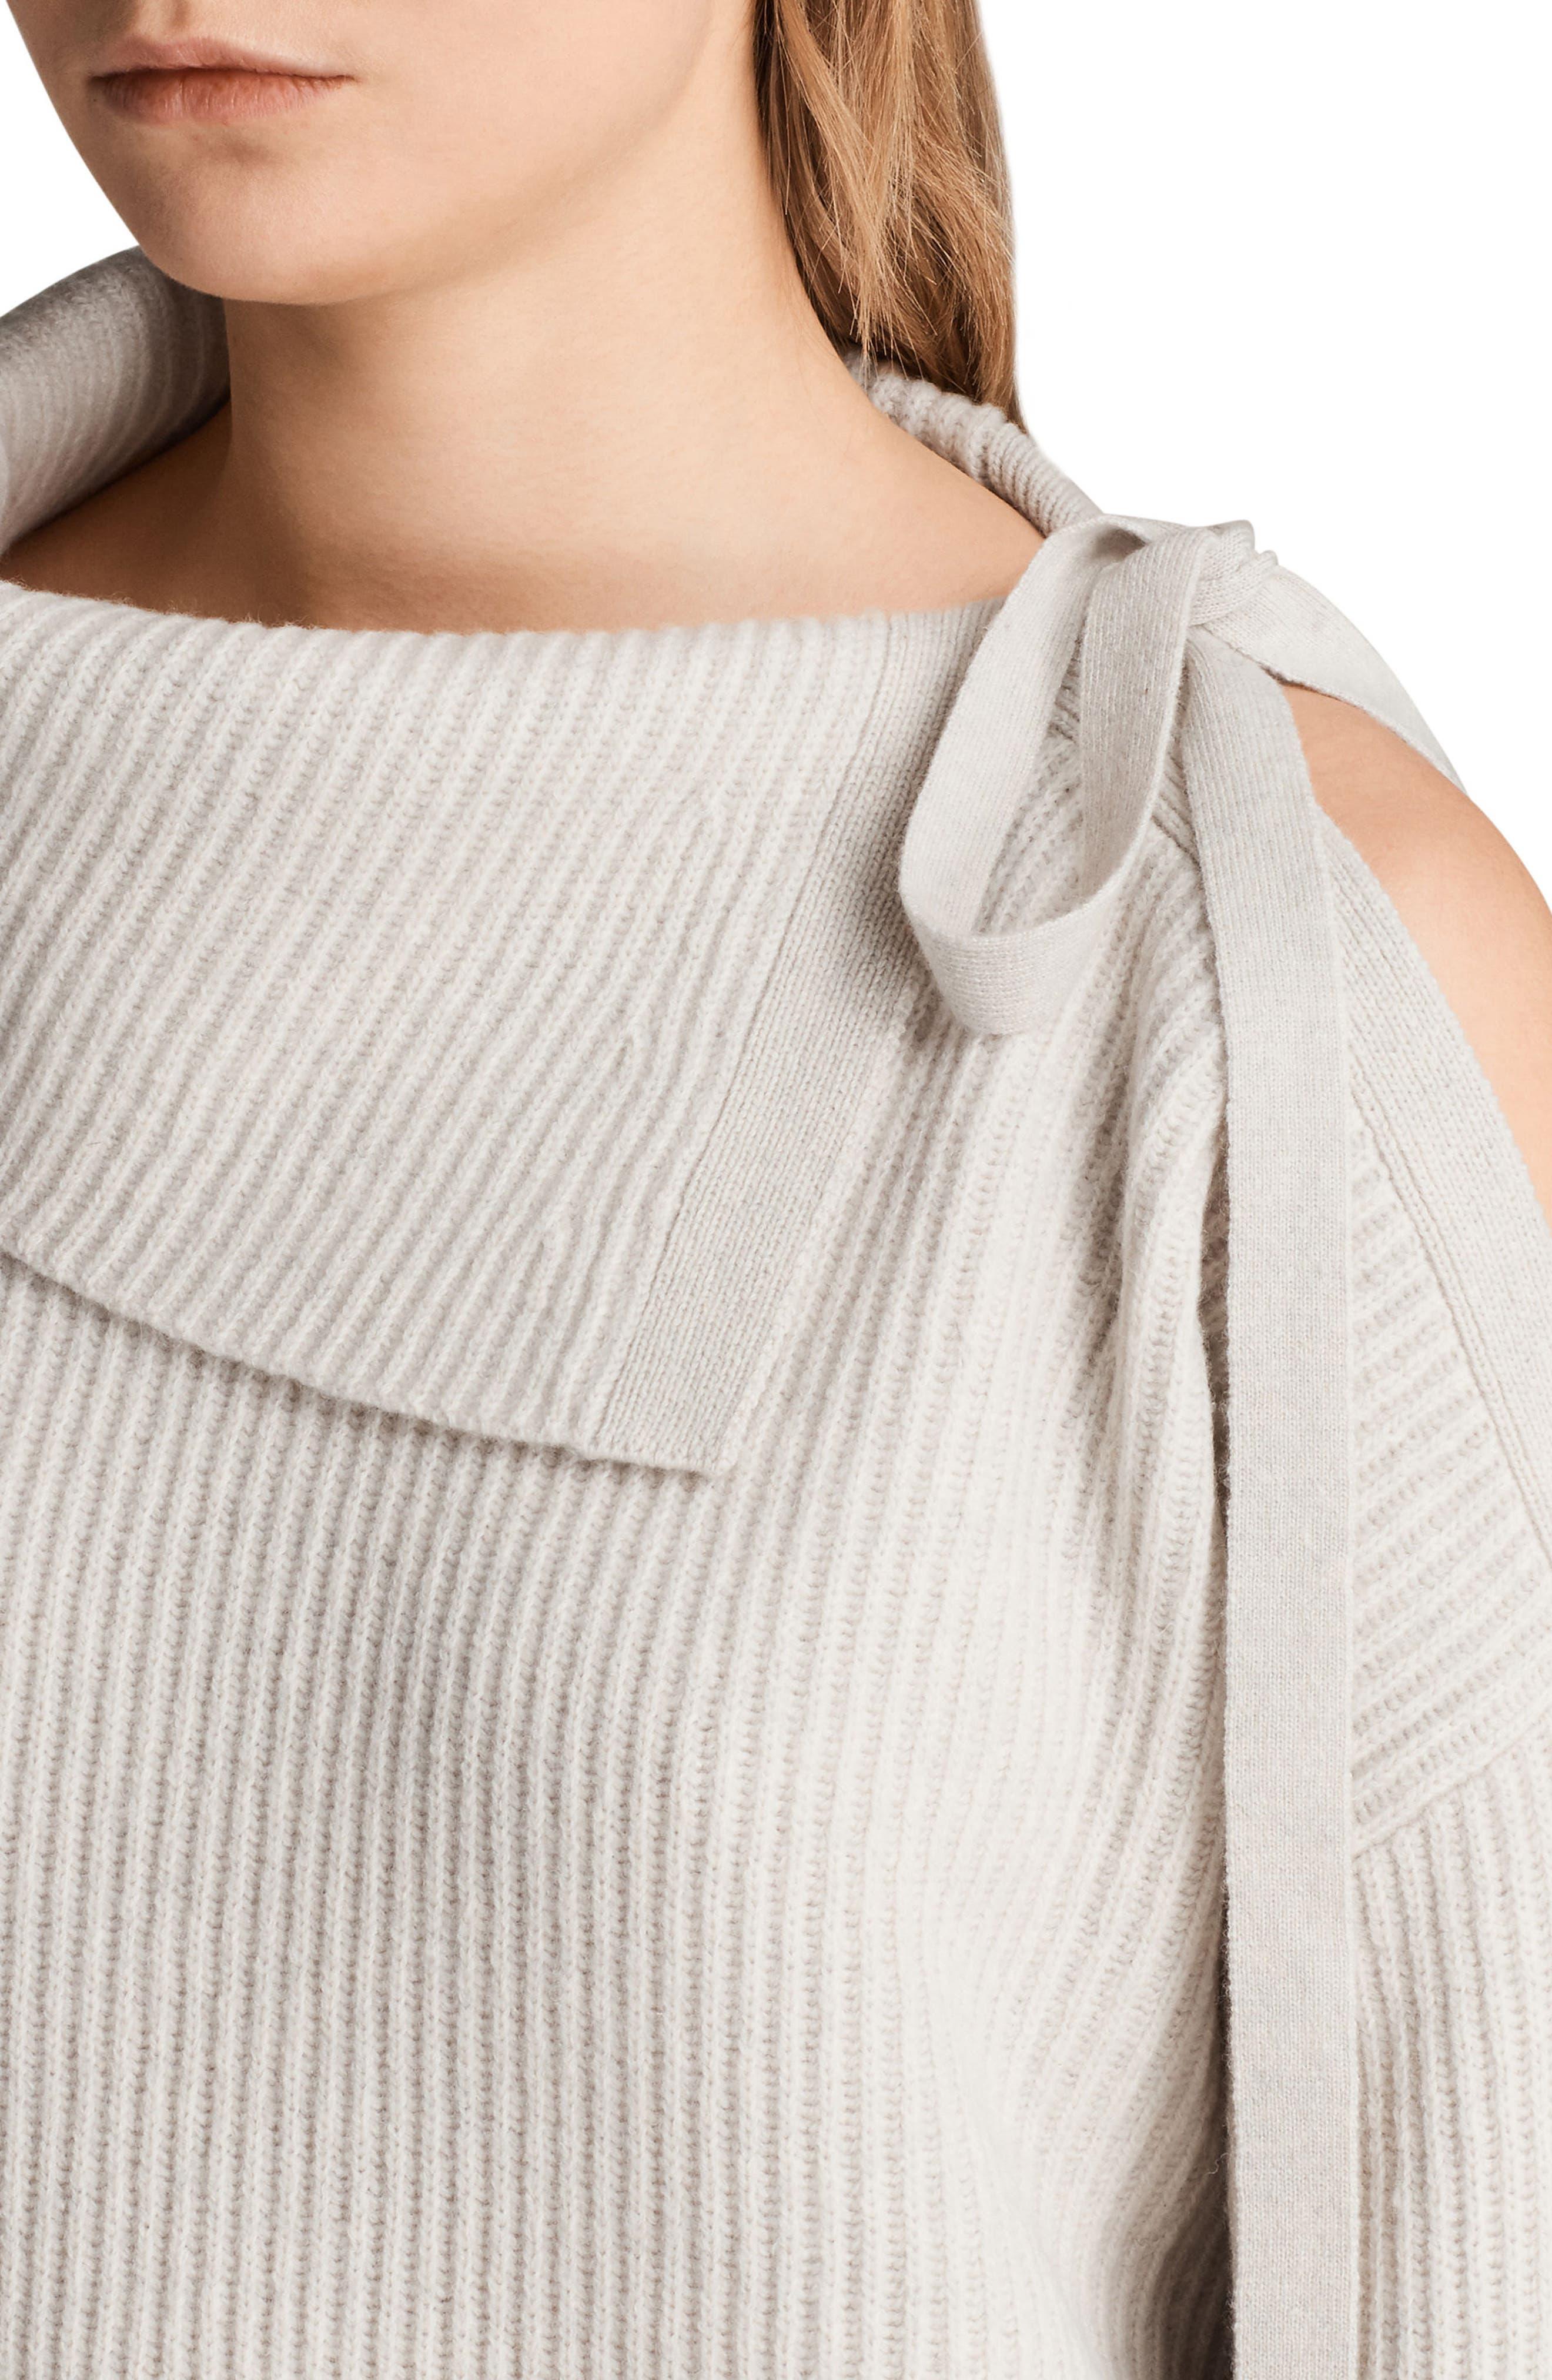 Sura Tie Neck Sweater,                             Alternate thumbnail 4, color,                             Wild Oat